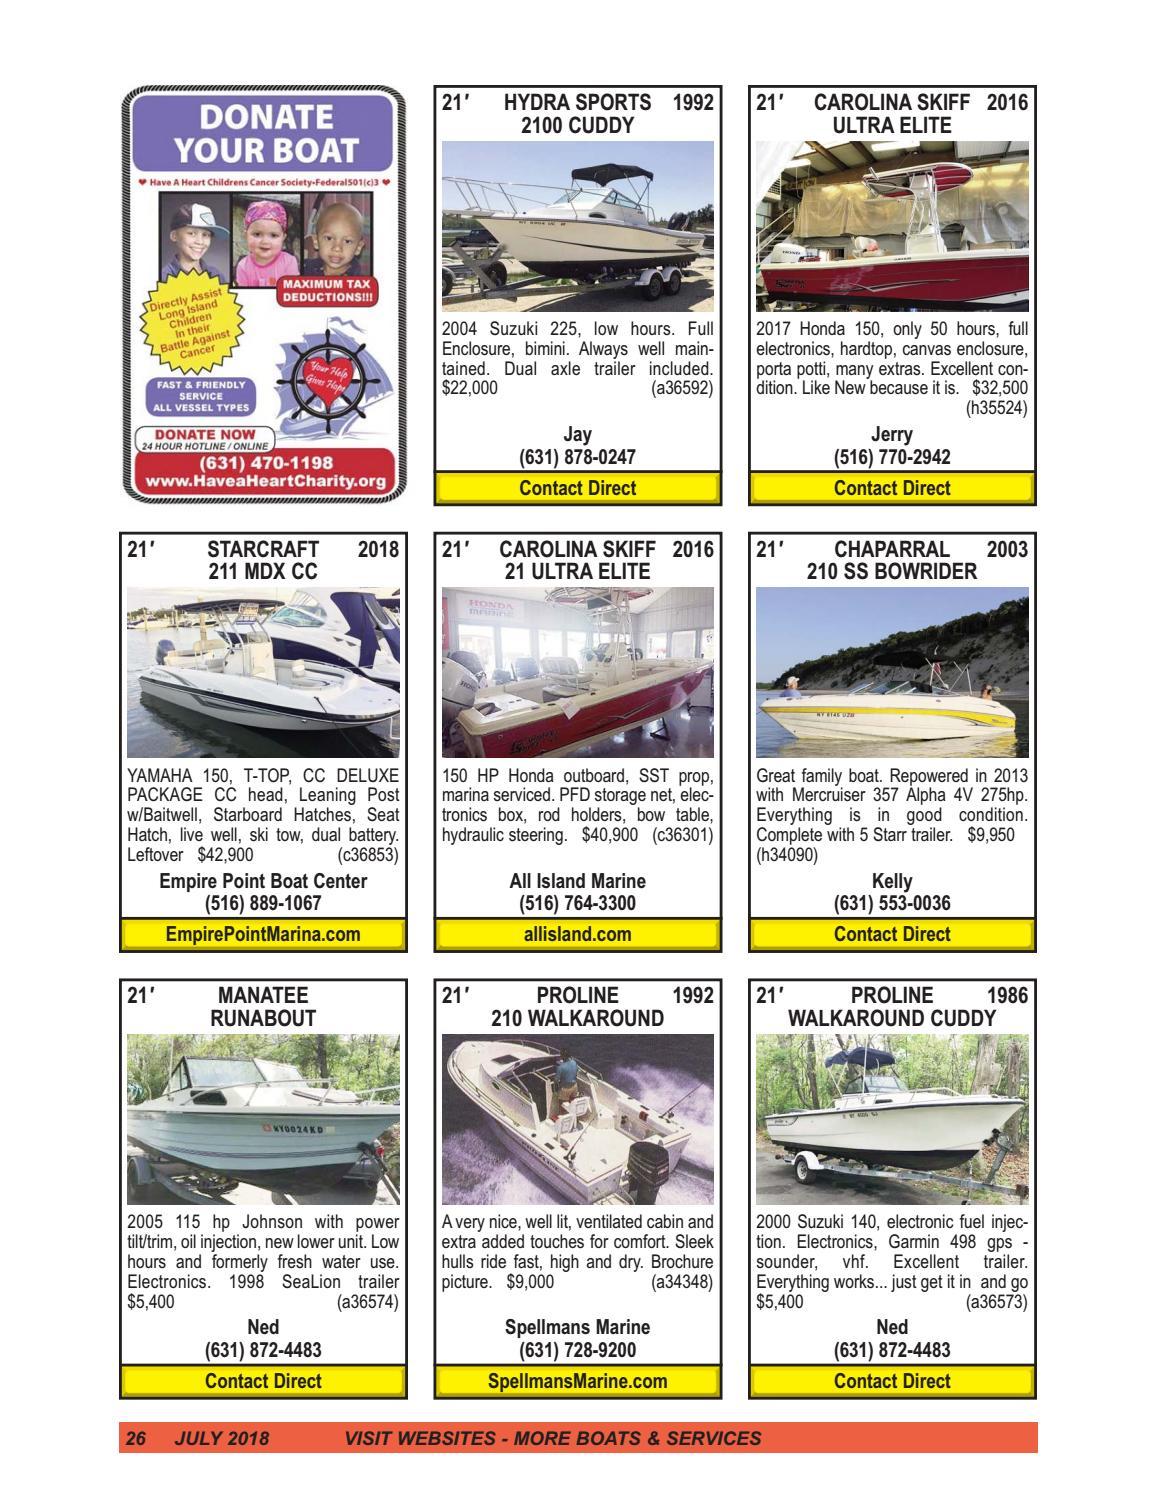 July 2018 issuu by Boats4Sale com Media - issuu